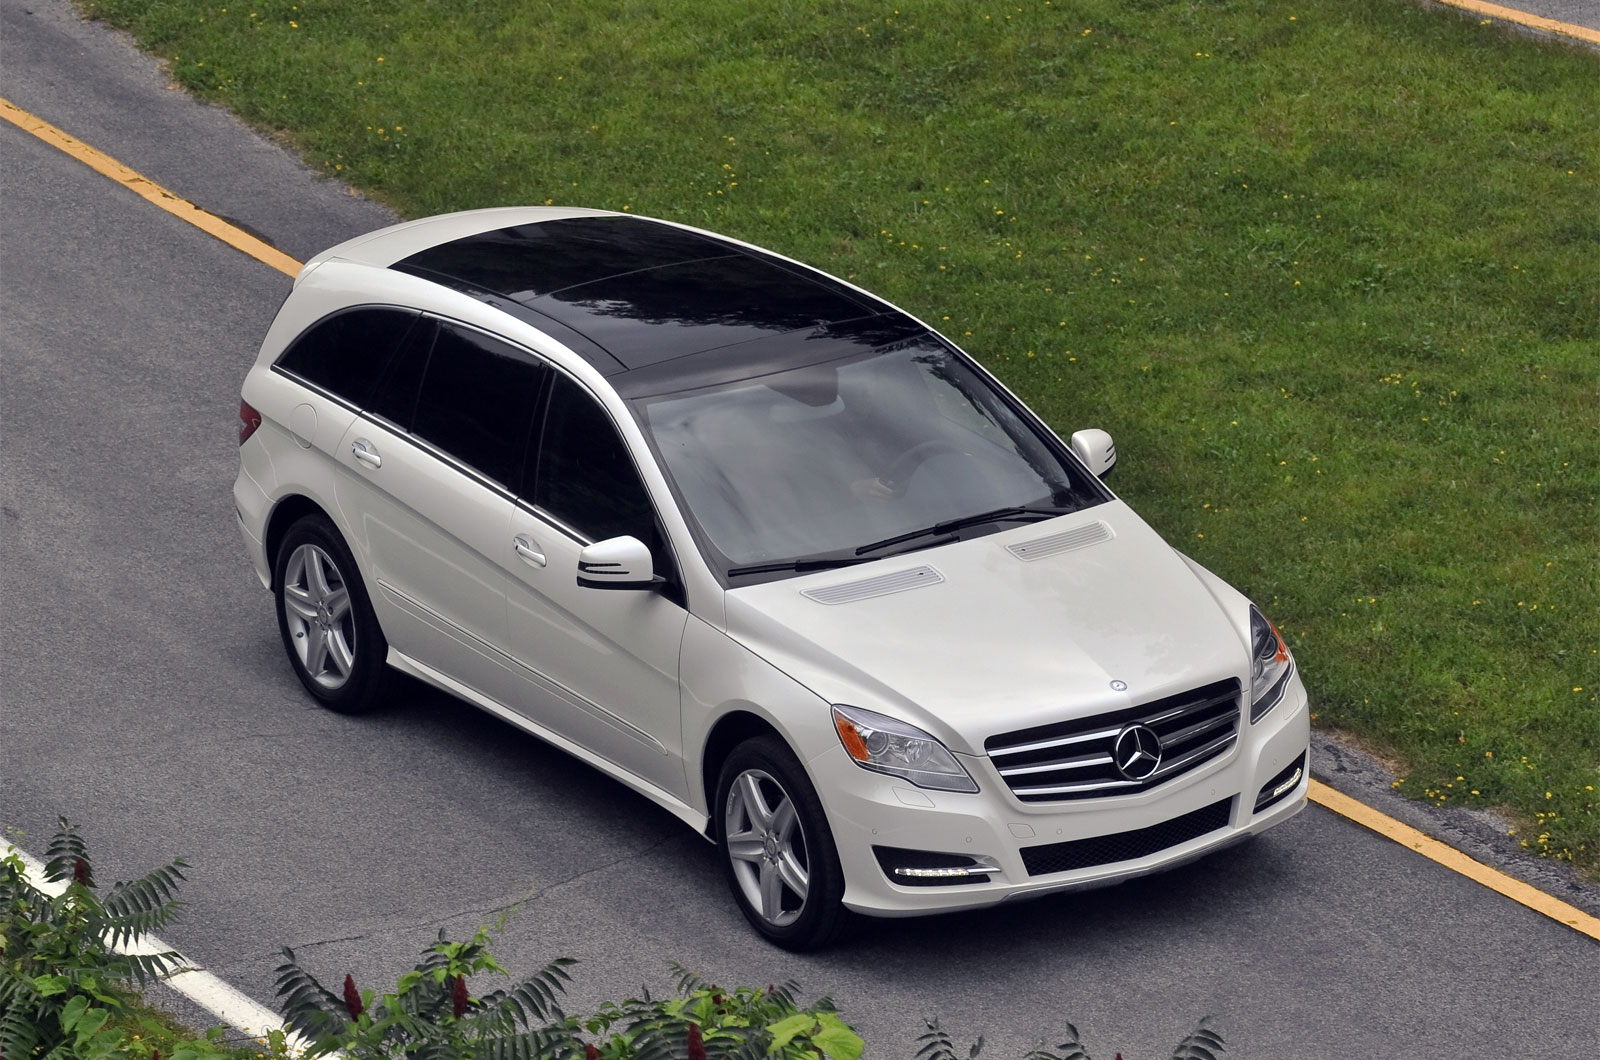 sport cars mercedes benz r350 hd wallpapers 2011. Black Bedroom Furniture Sets. Home Design Ideas